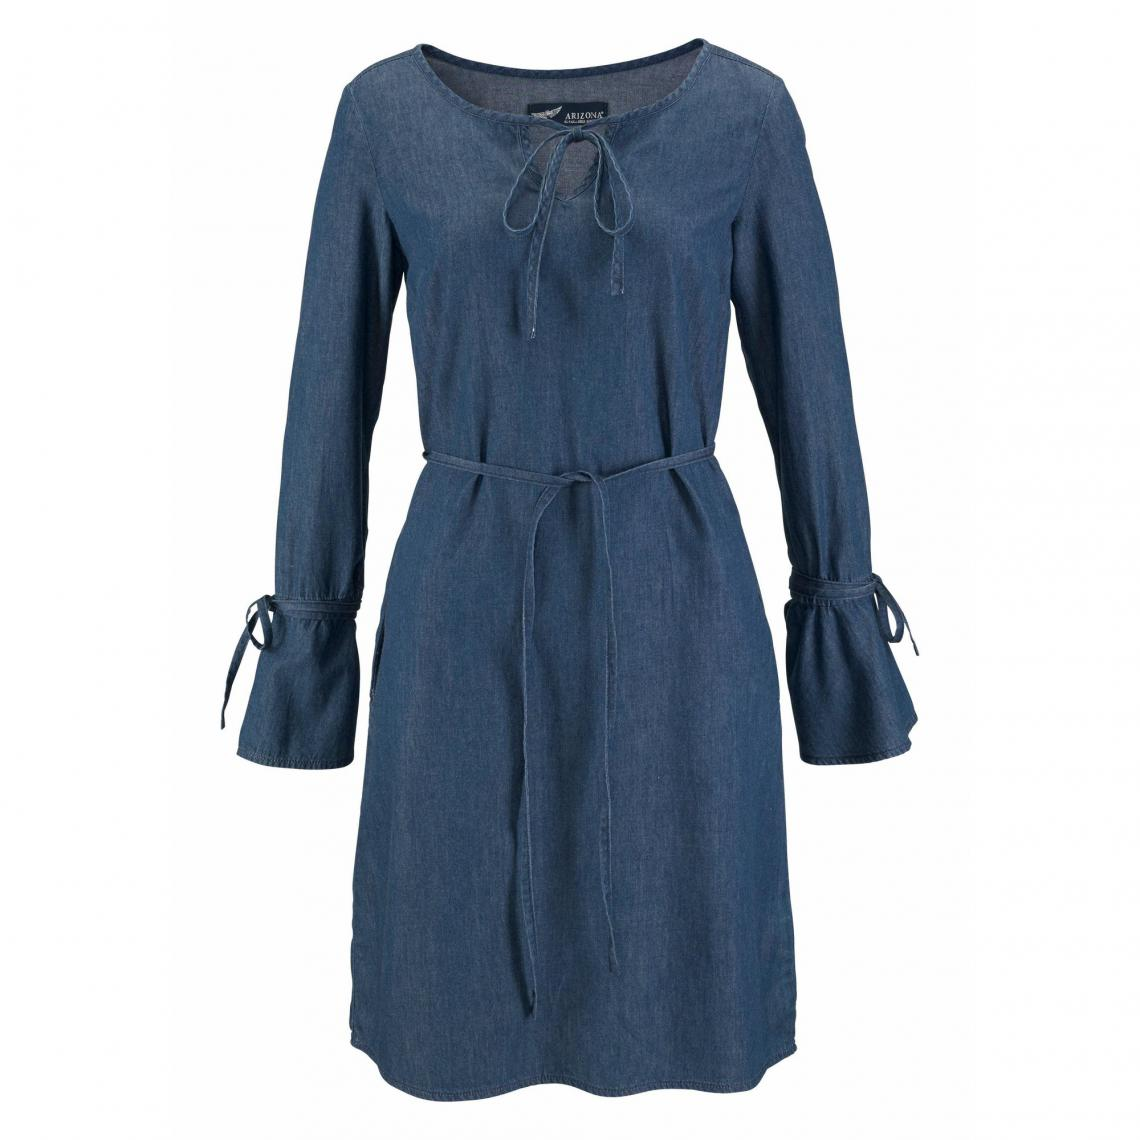 fb1c2da9abeb2 Robe manches longues en denim femme Arizona - bleu foncé Arizona